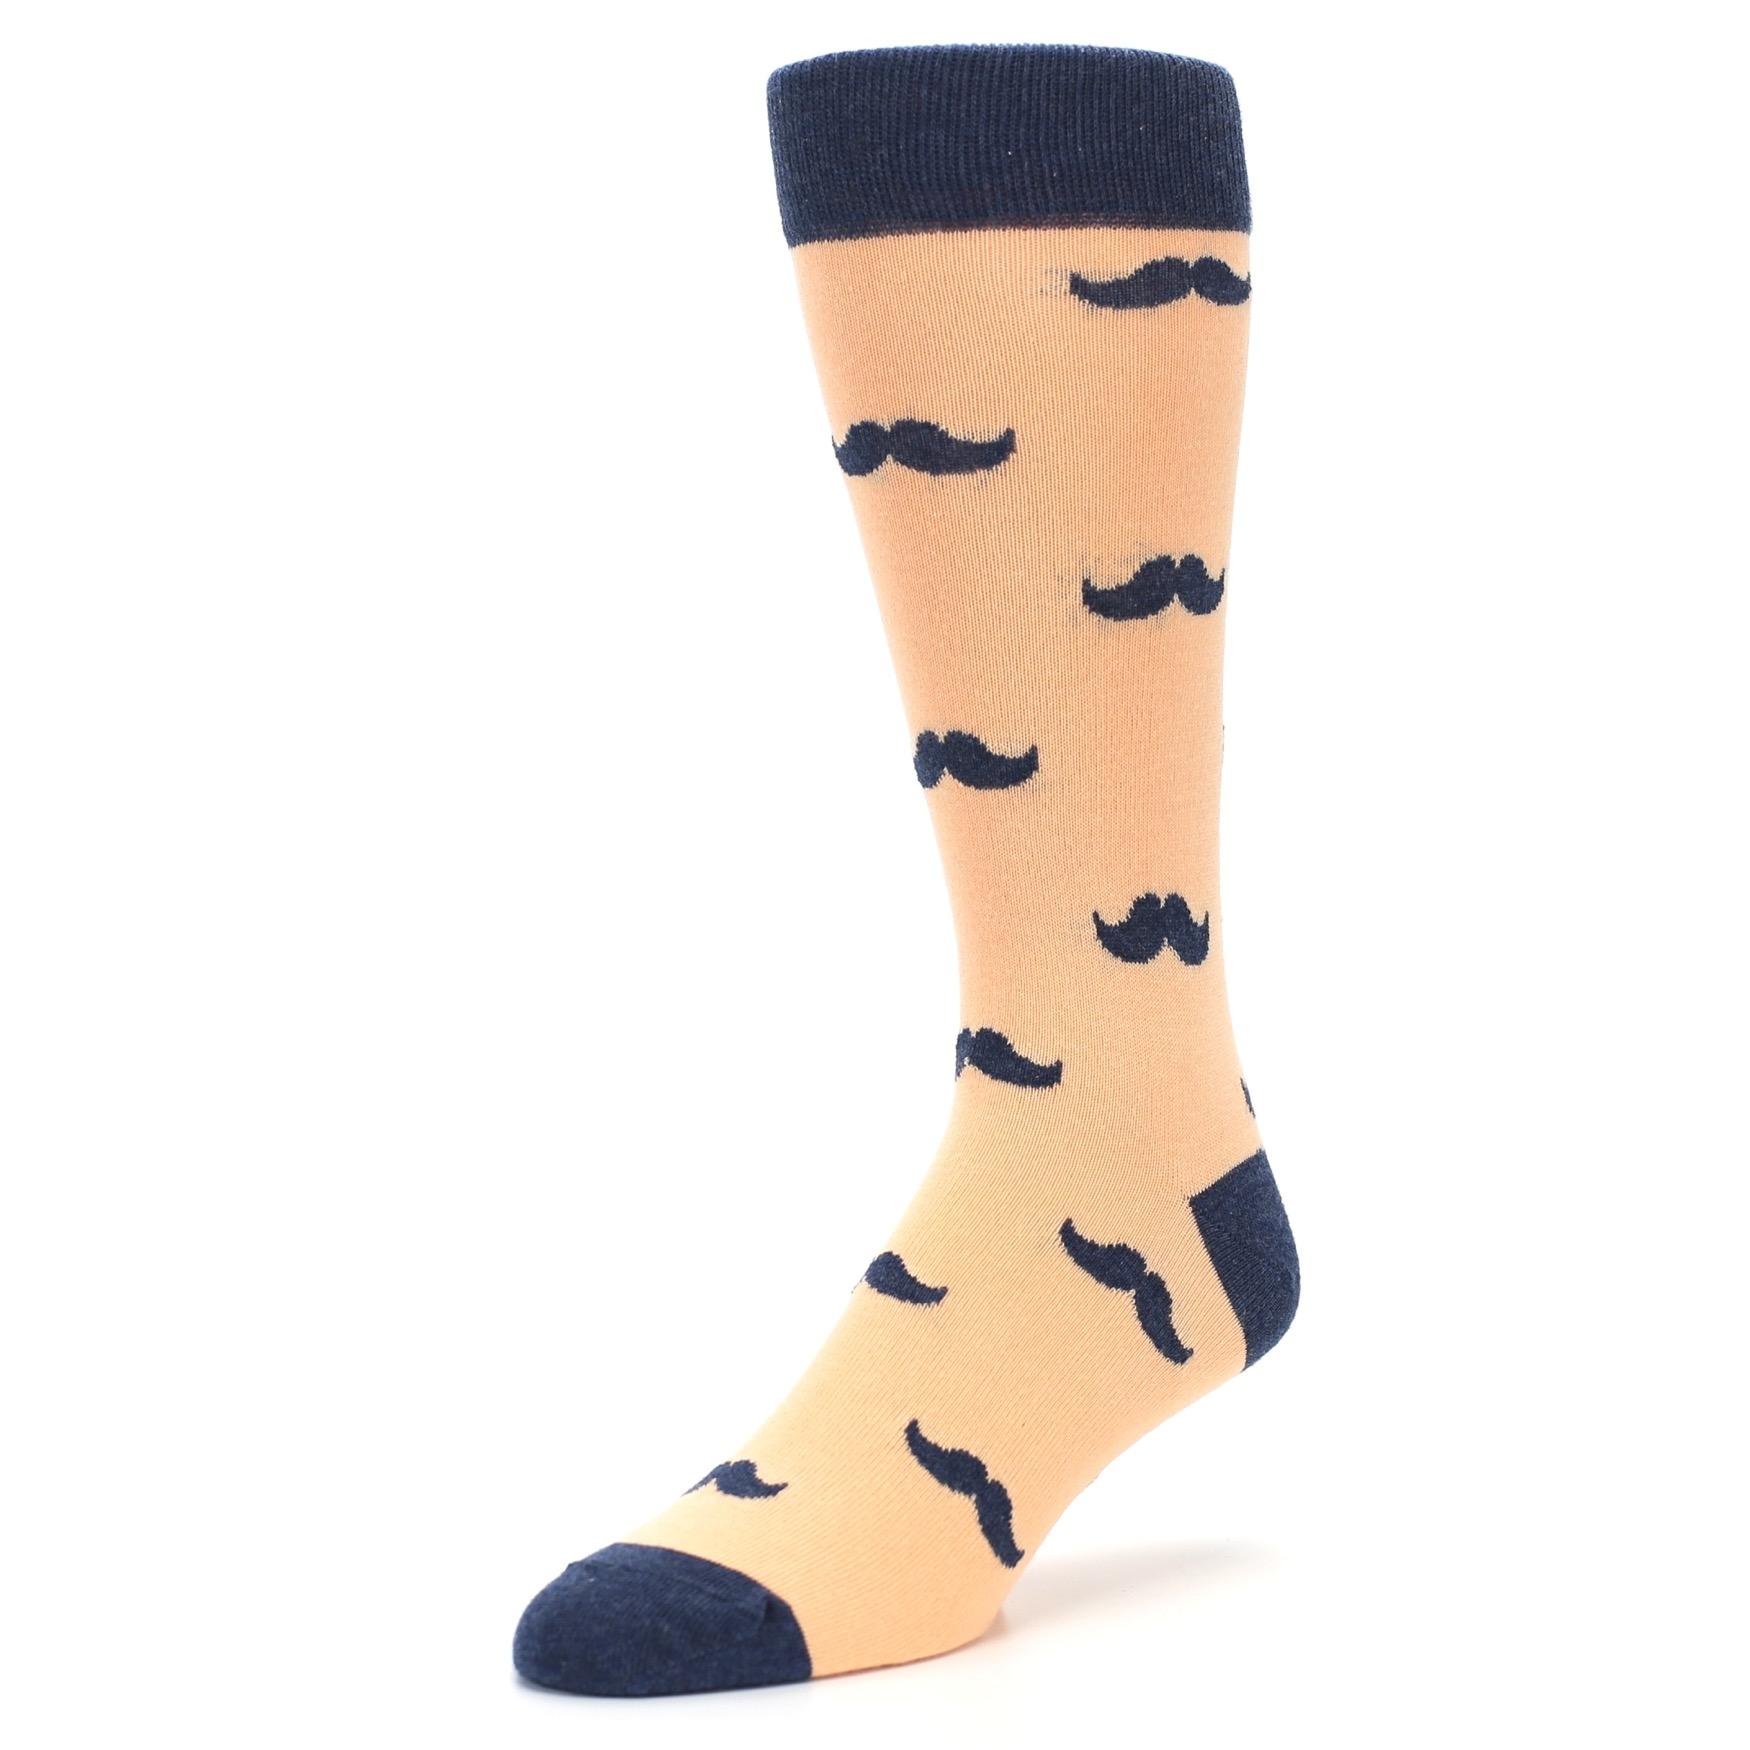 Peach Navy Mustache Groomsmen Wedding Men's Dress Socks